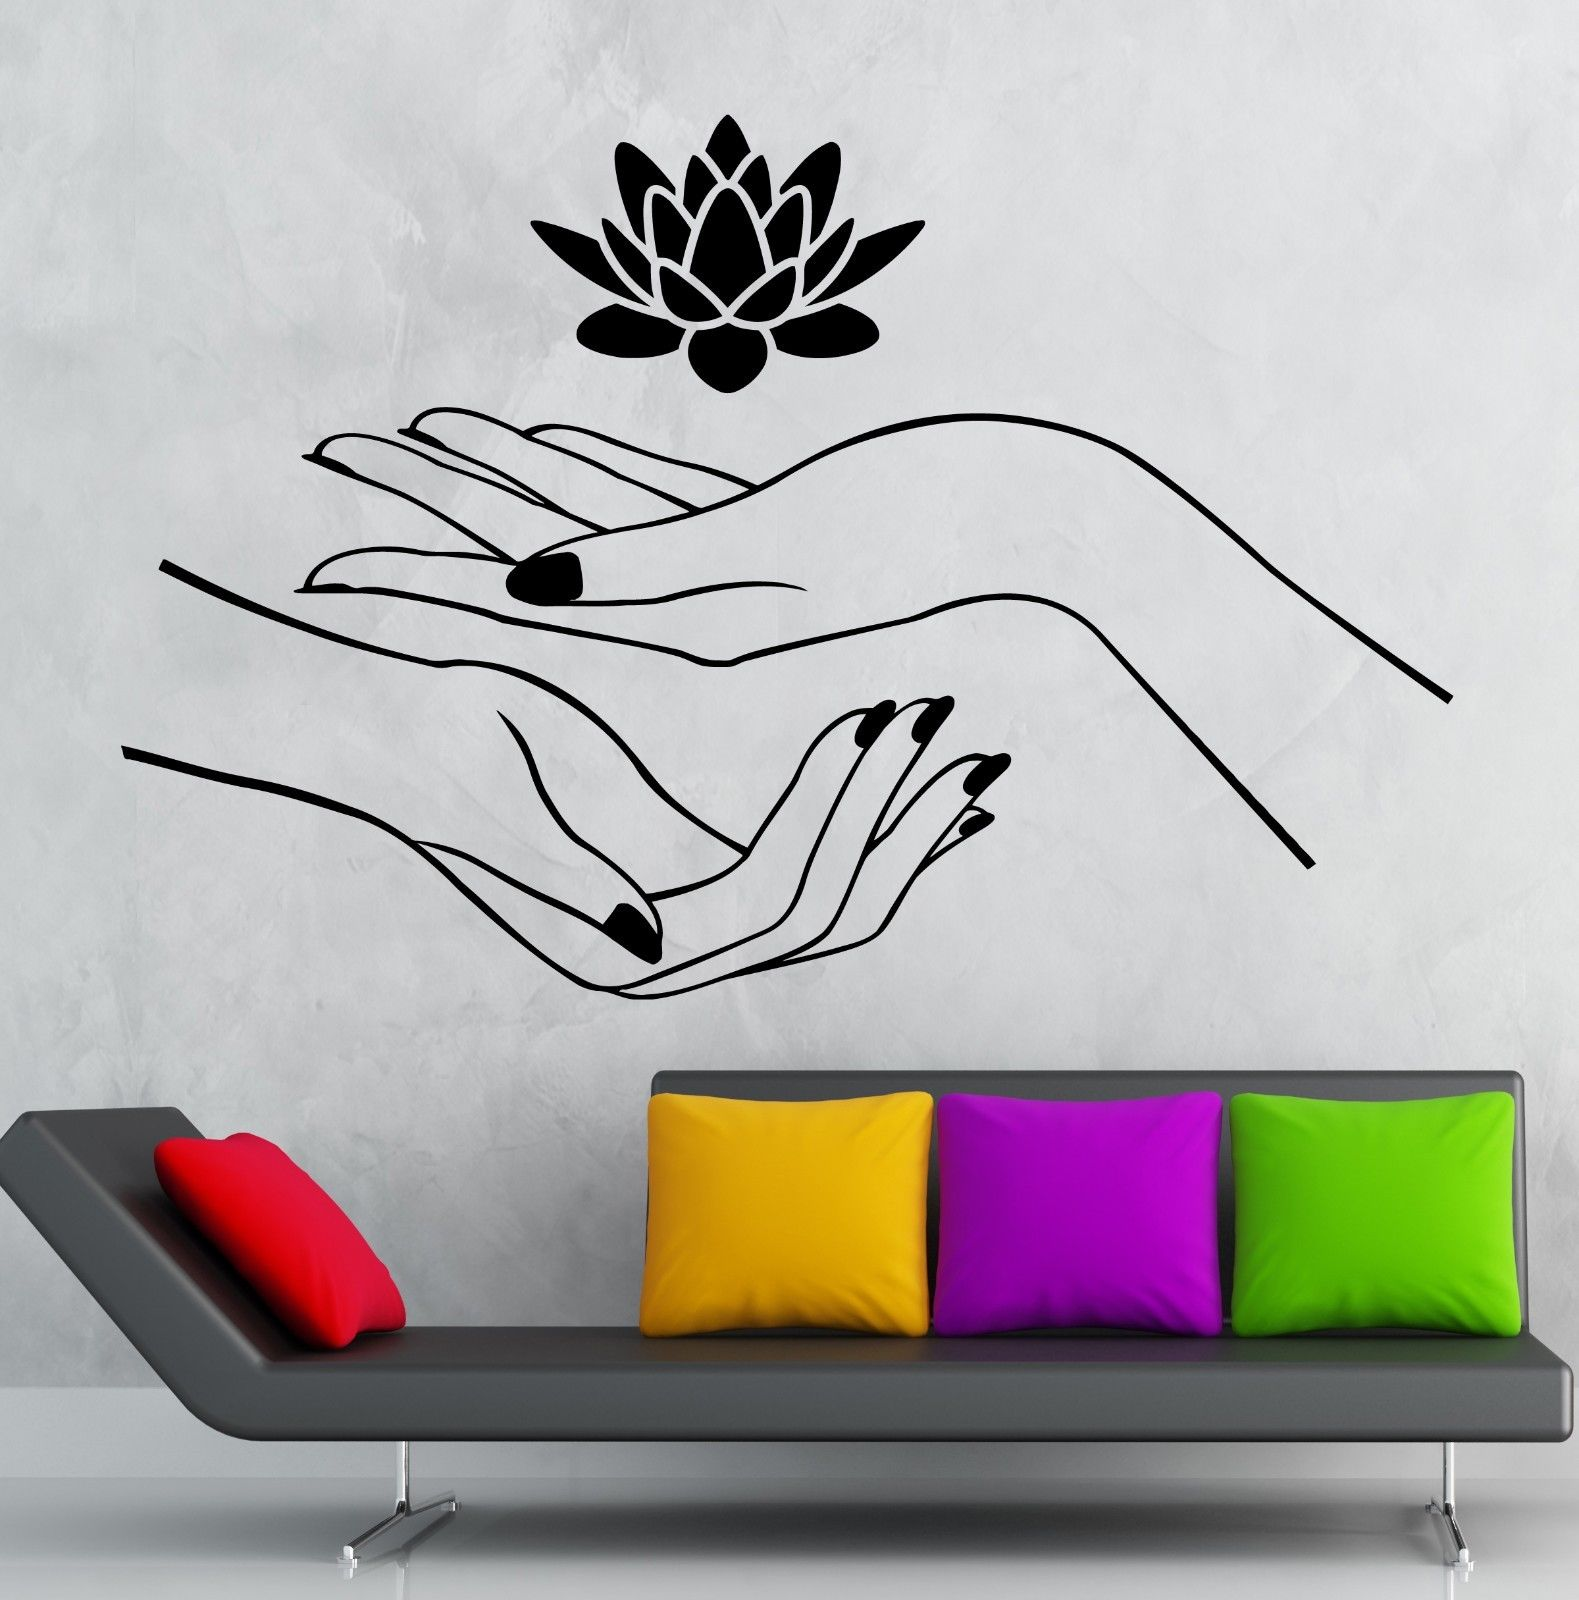 ୧ʕ ʔ୨fashion House Lotus Wall 【】 Stickers Stickers Hands